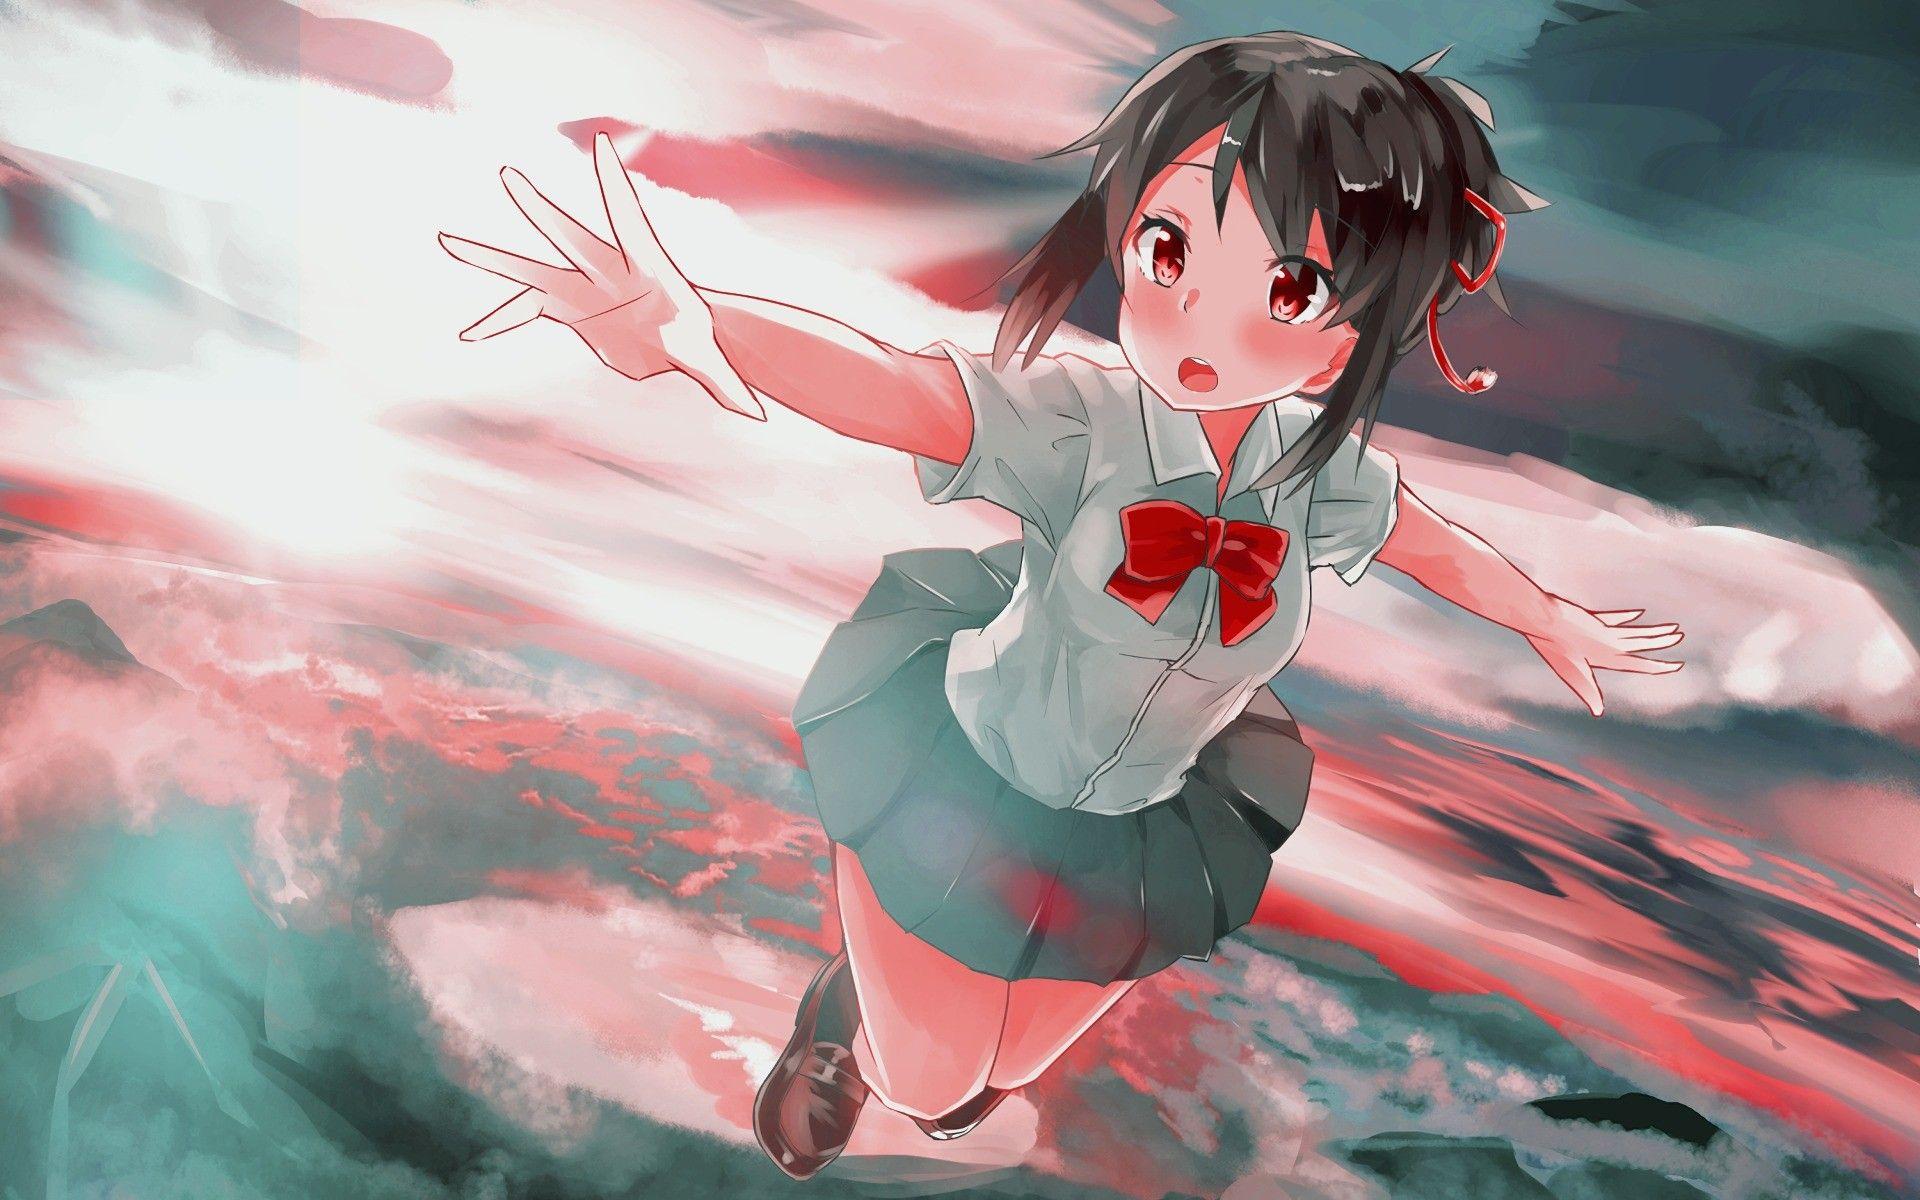 Pin de Raya em нєα∂єя ⃟⸙ꦿ̽༄ Filmes de anime, Anime, Kimi